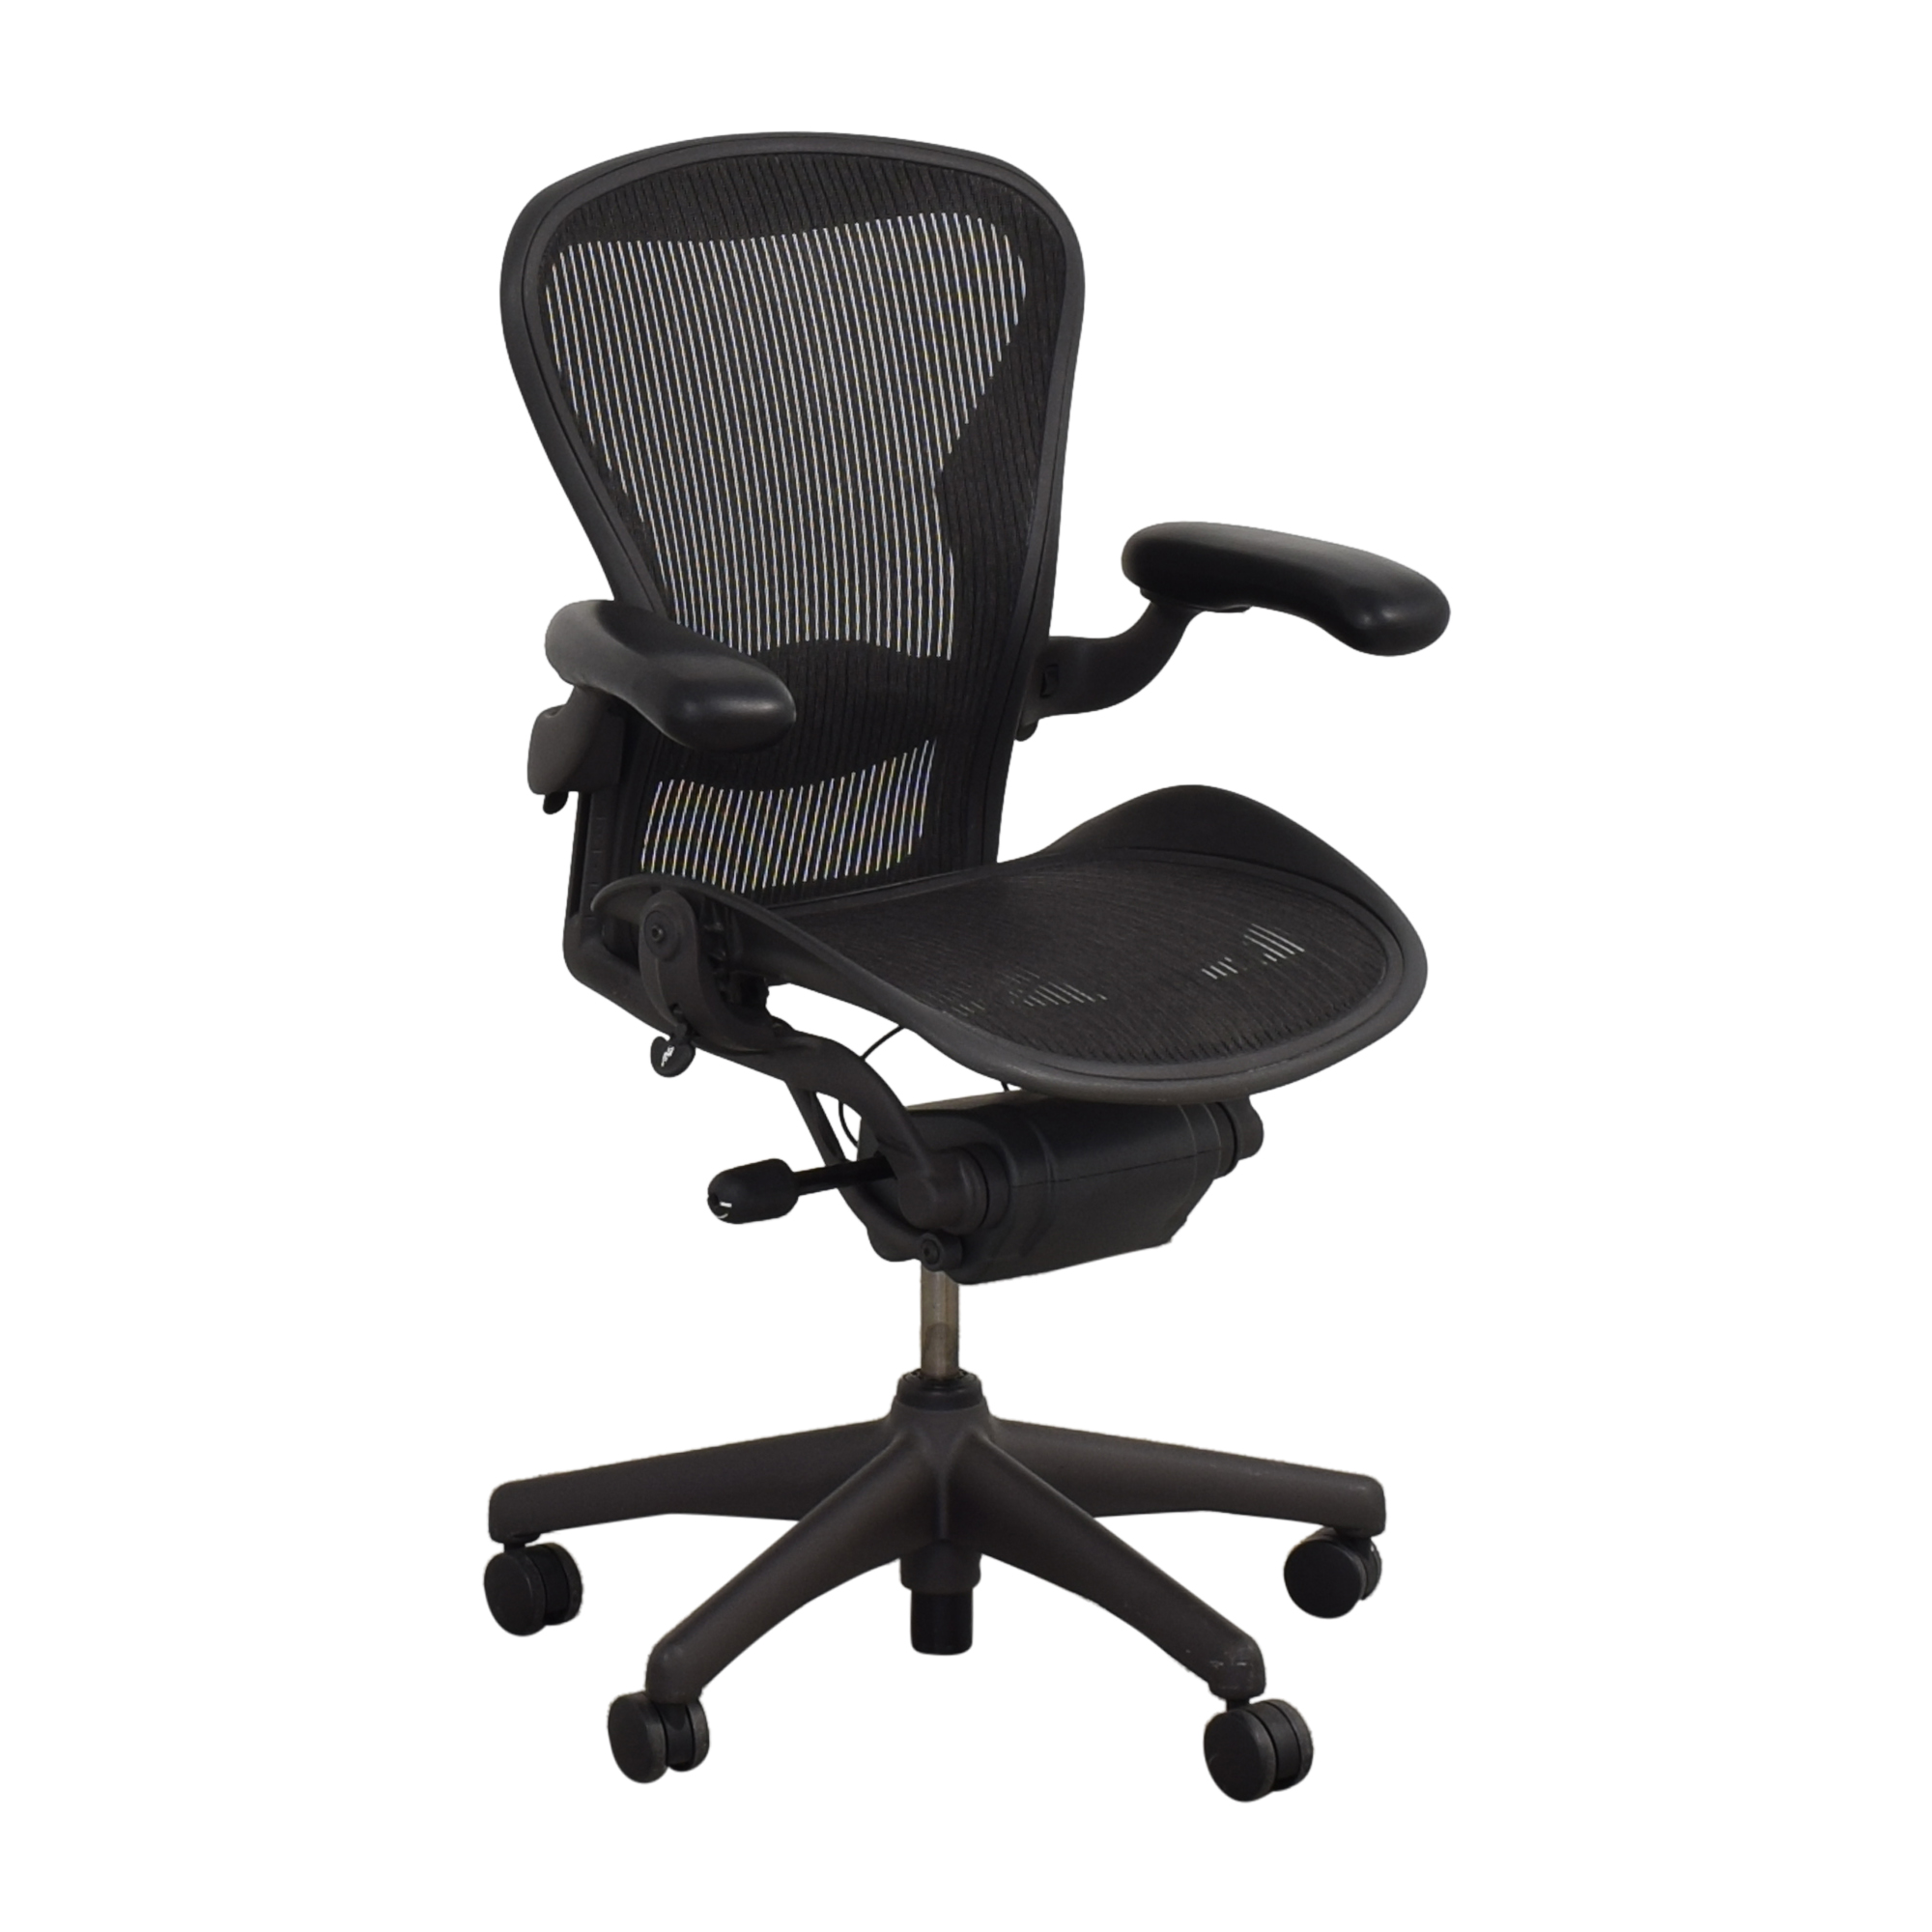 Herman Miller Herman Miller Aeron Chair Black